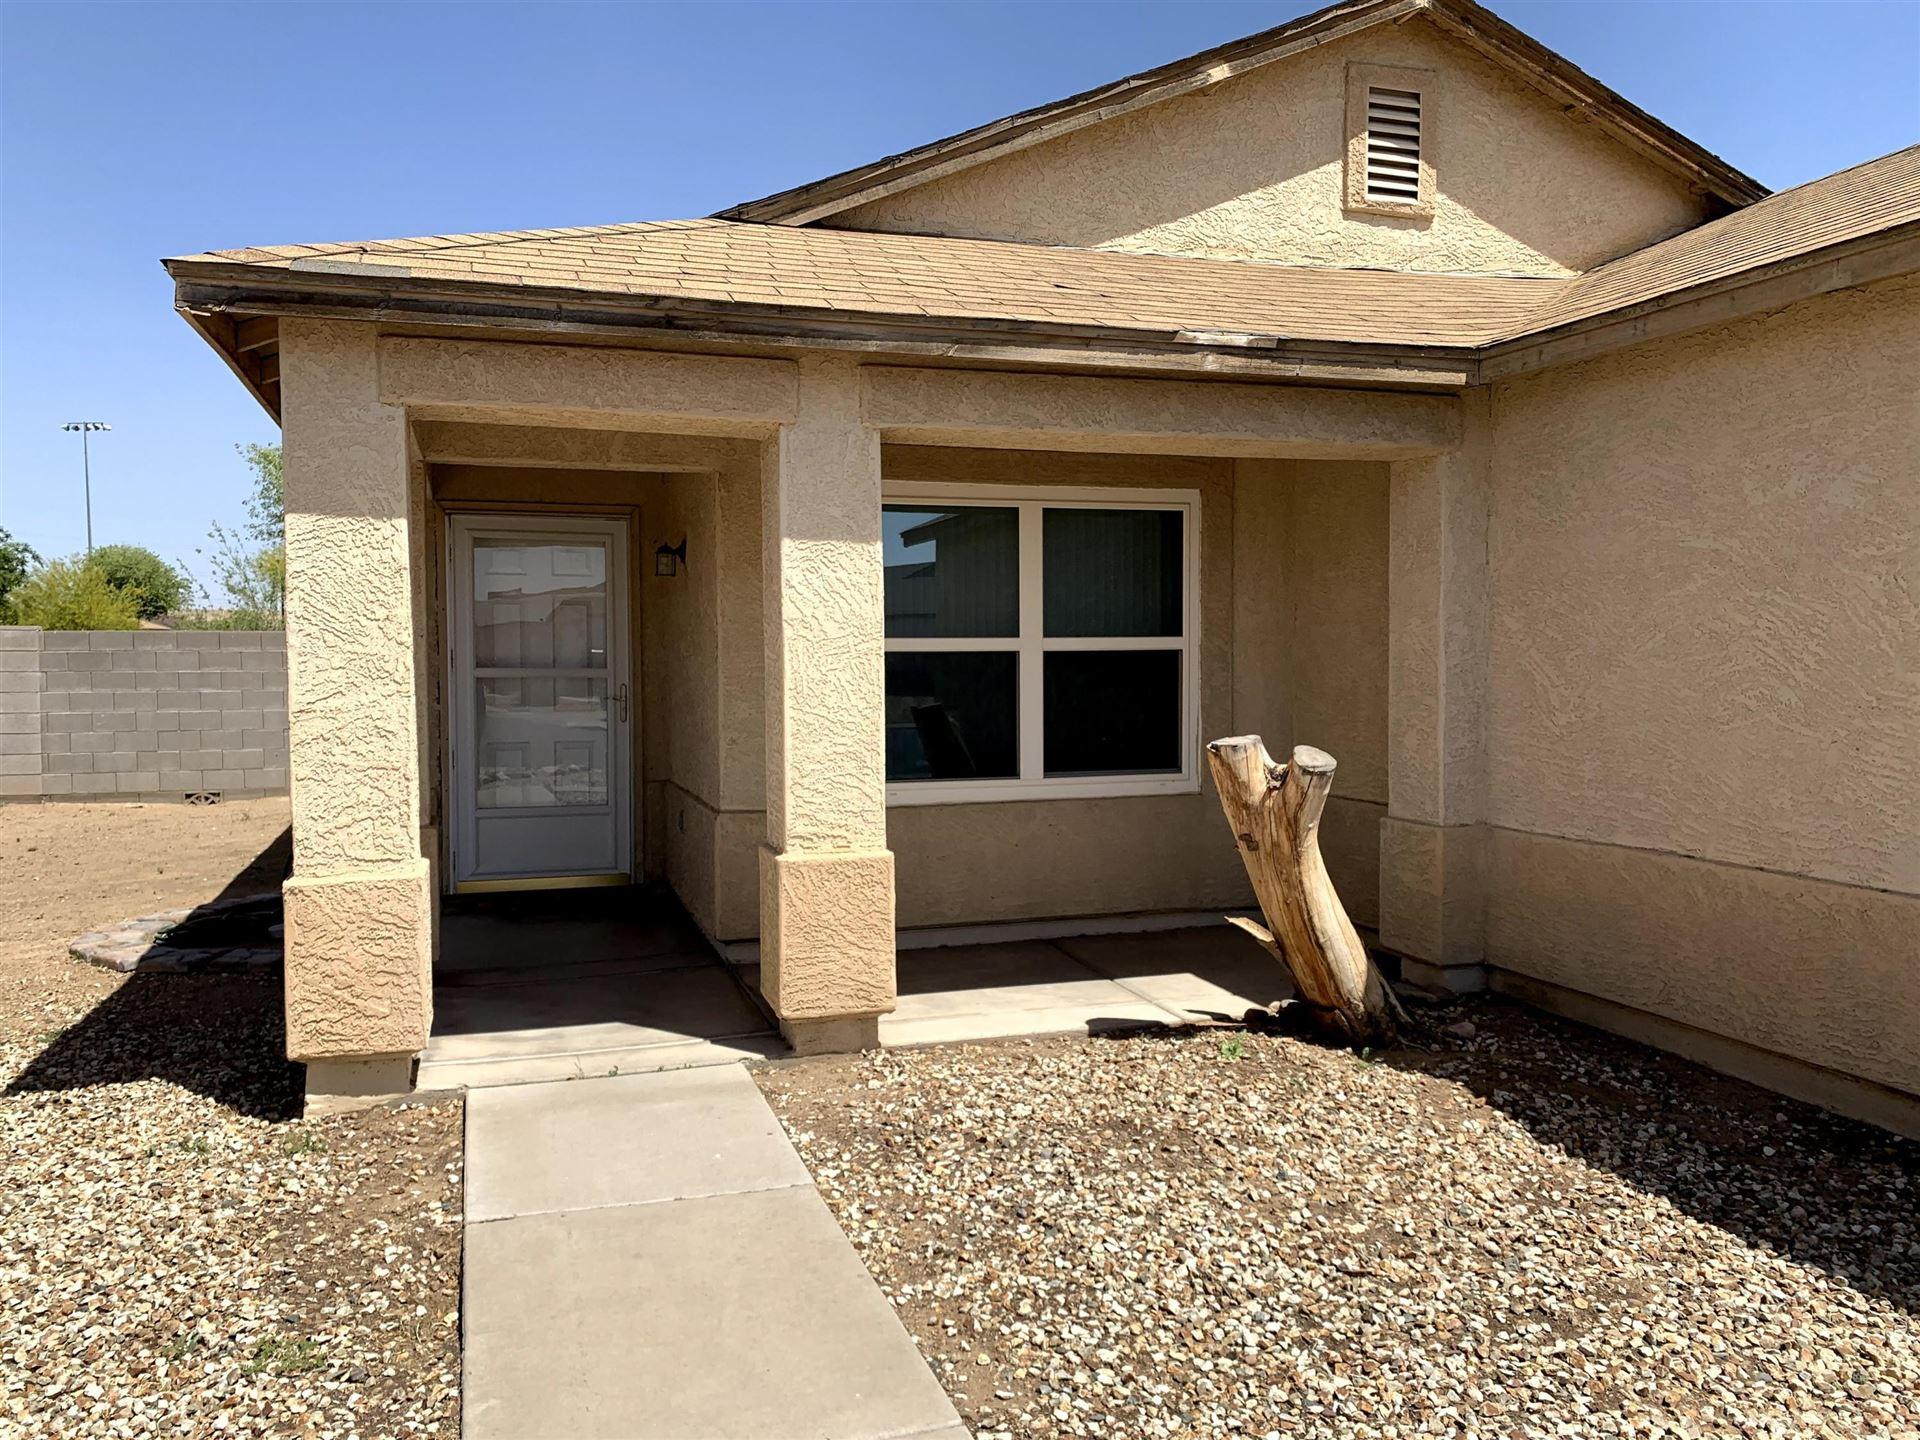 Photo of 12555 N PABLO Street, El Mirage, AZ 85335 (MLS # 6227519)